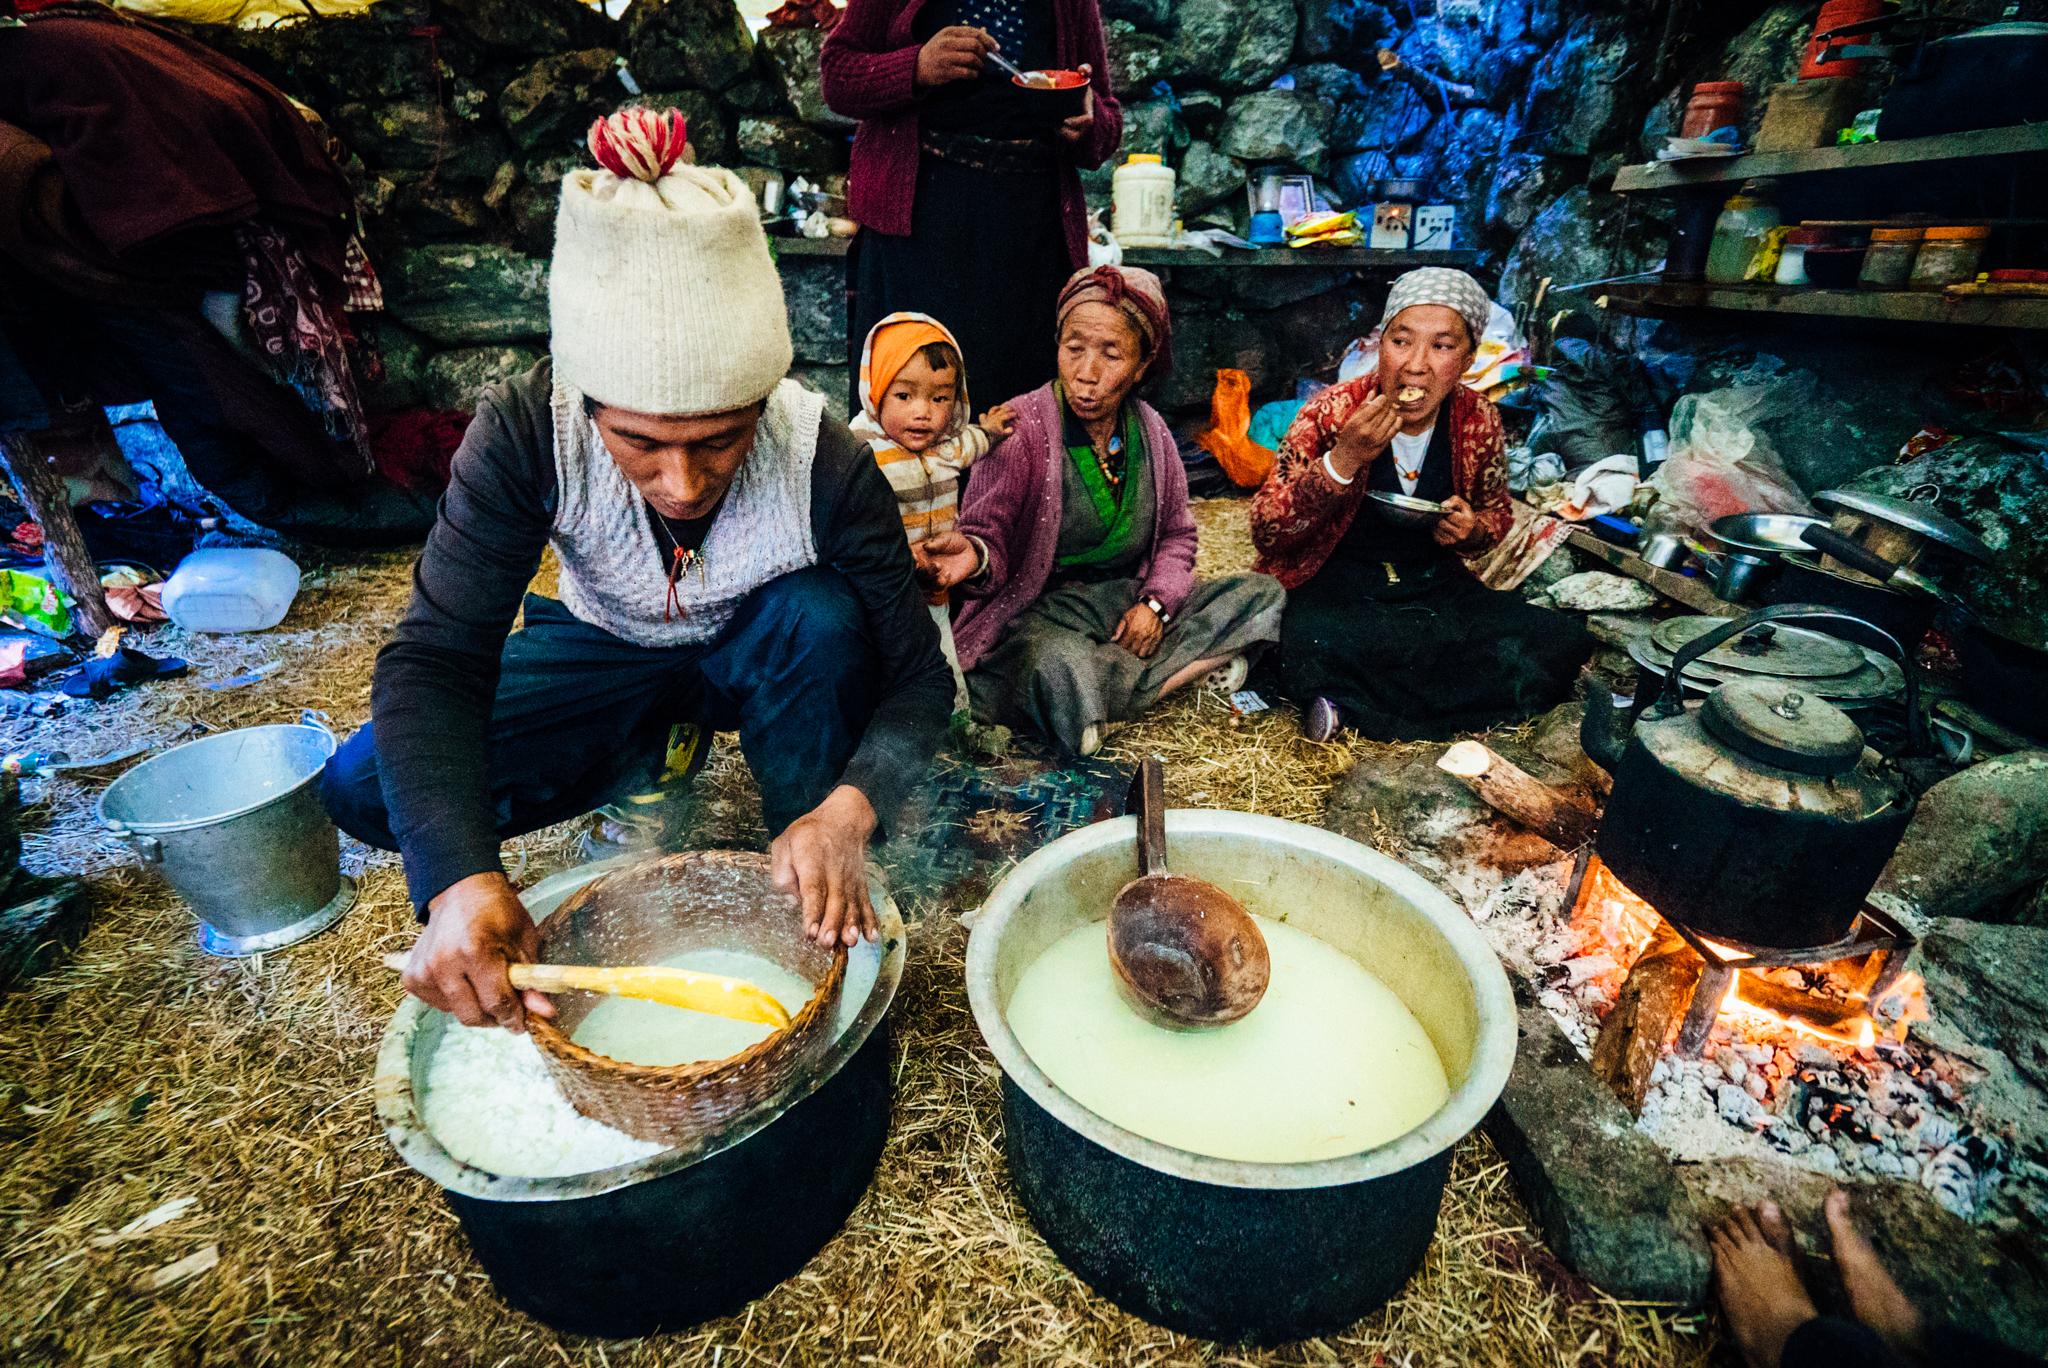 Langtang-Nepal-A7S-NOV15-25.jpg